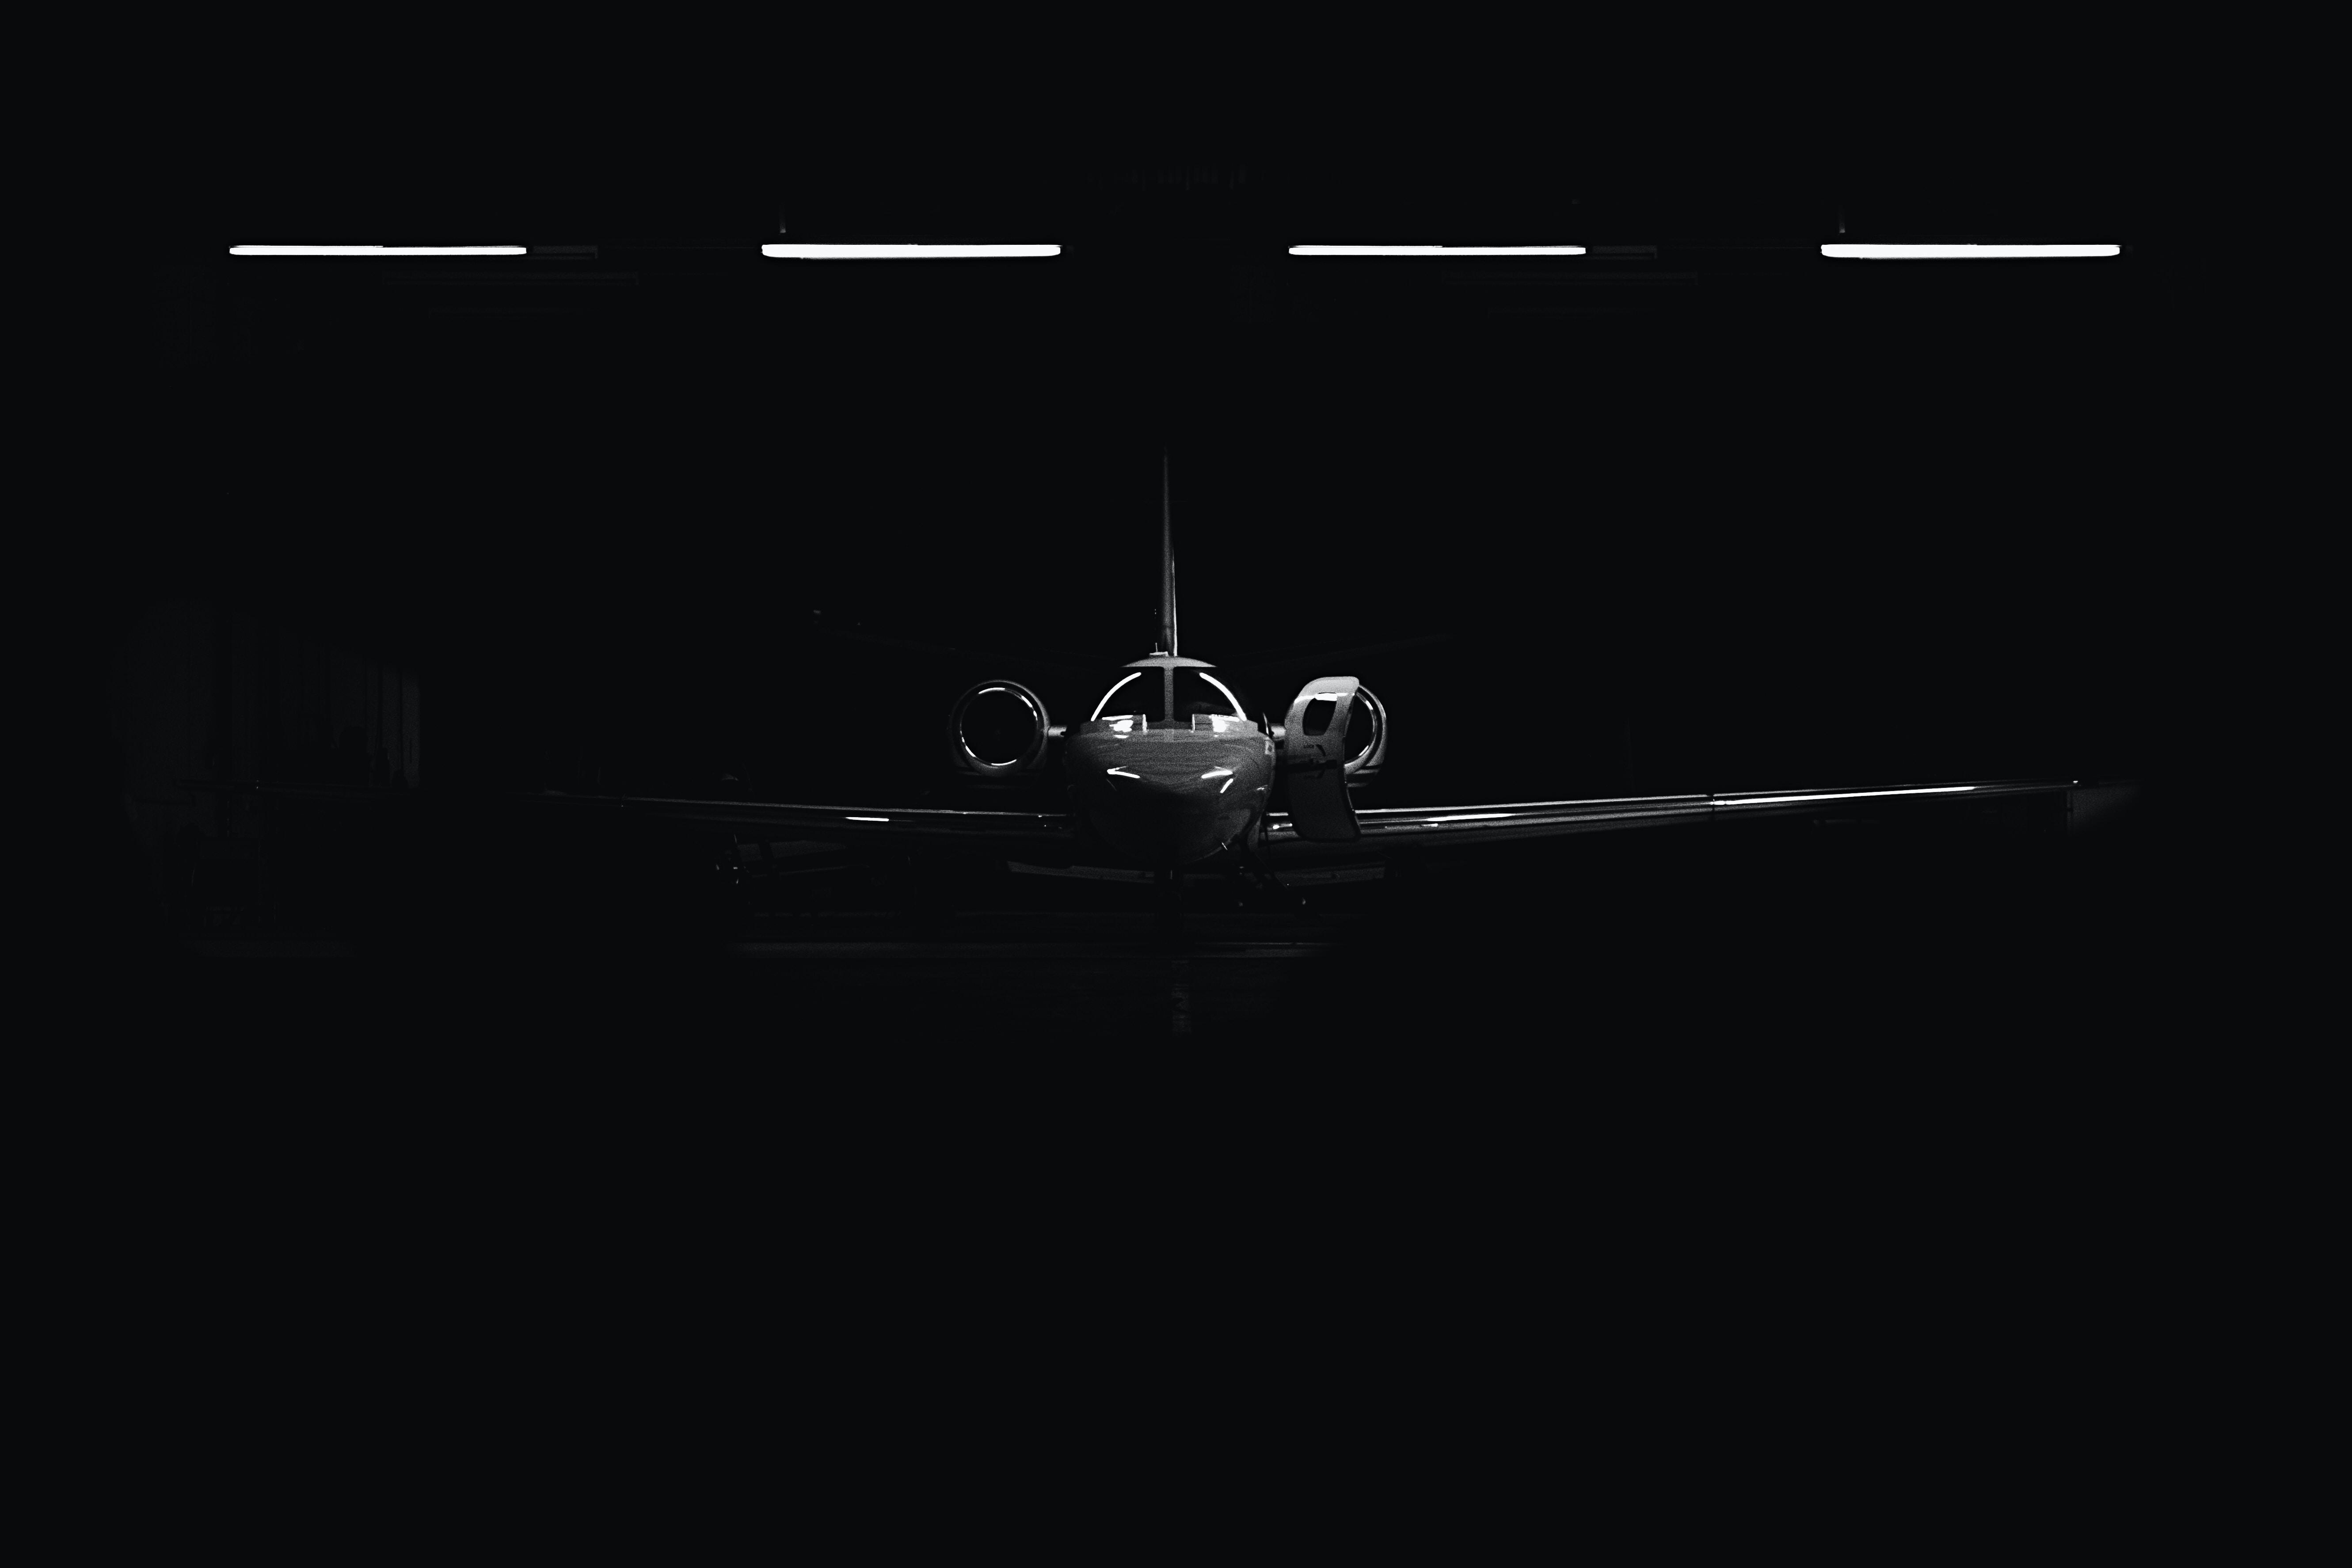 A dim shot of a glossy airplane in a dark hangar